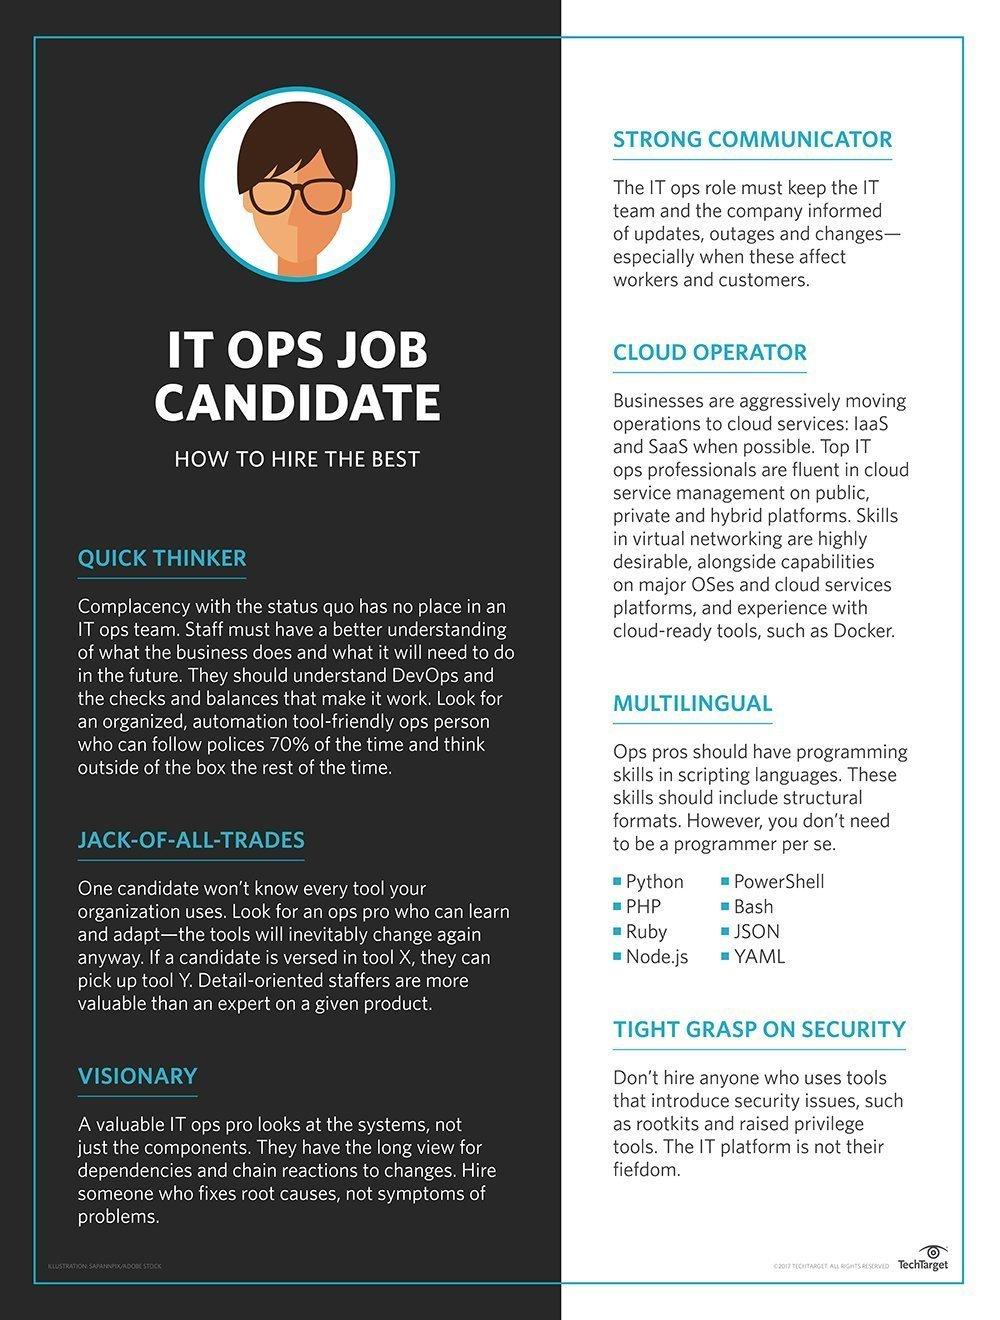 An IT operations job description written for the future